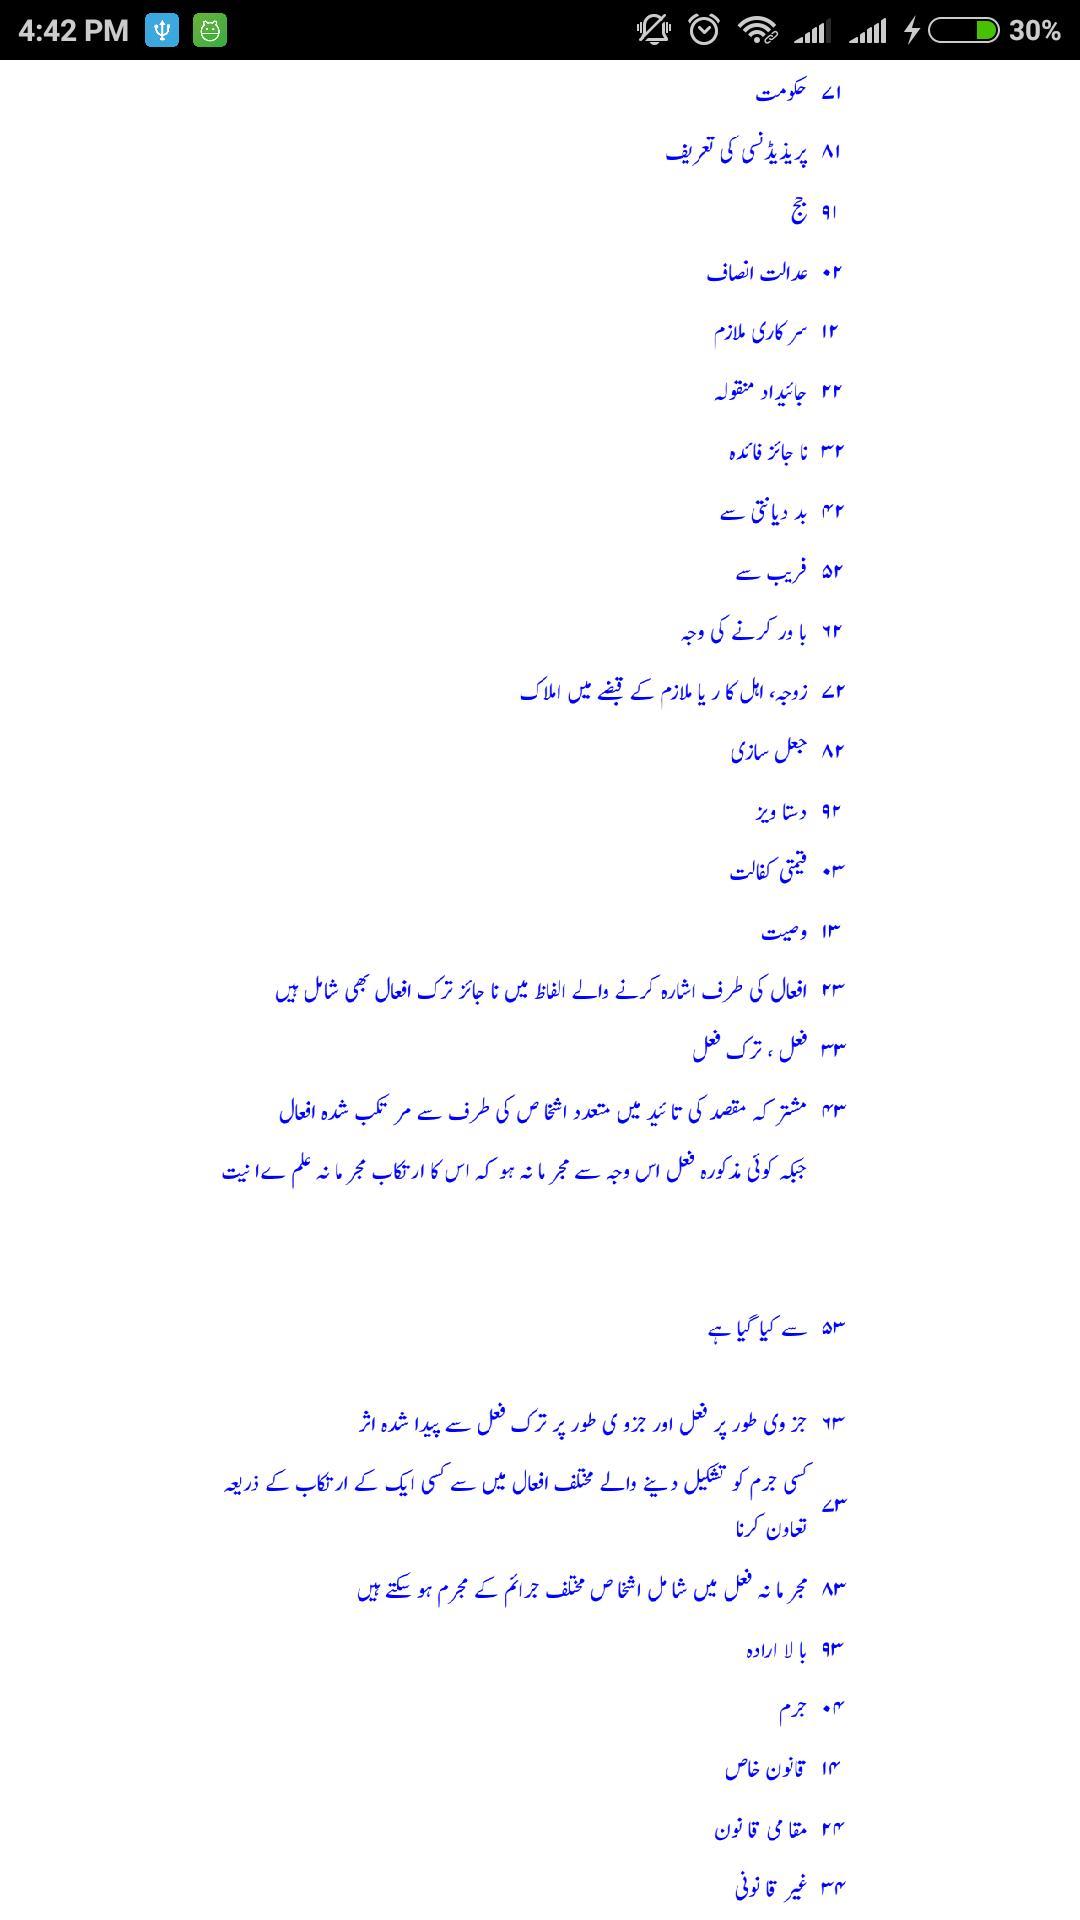 PPC Pakistan Penal Code 1860 in Urdu for Android - APK Download